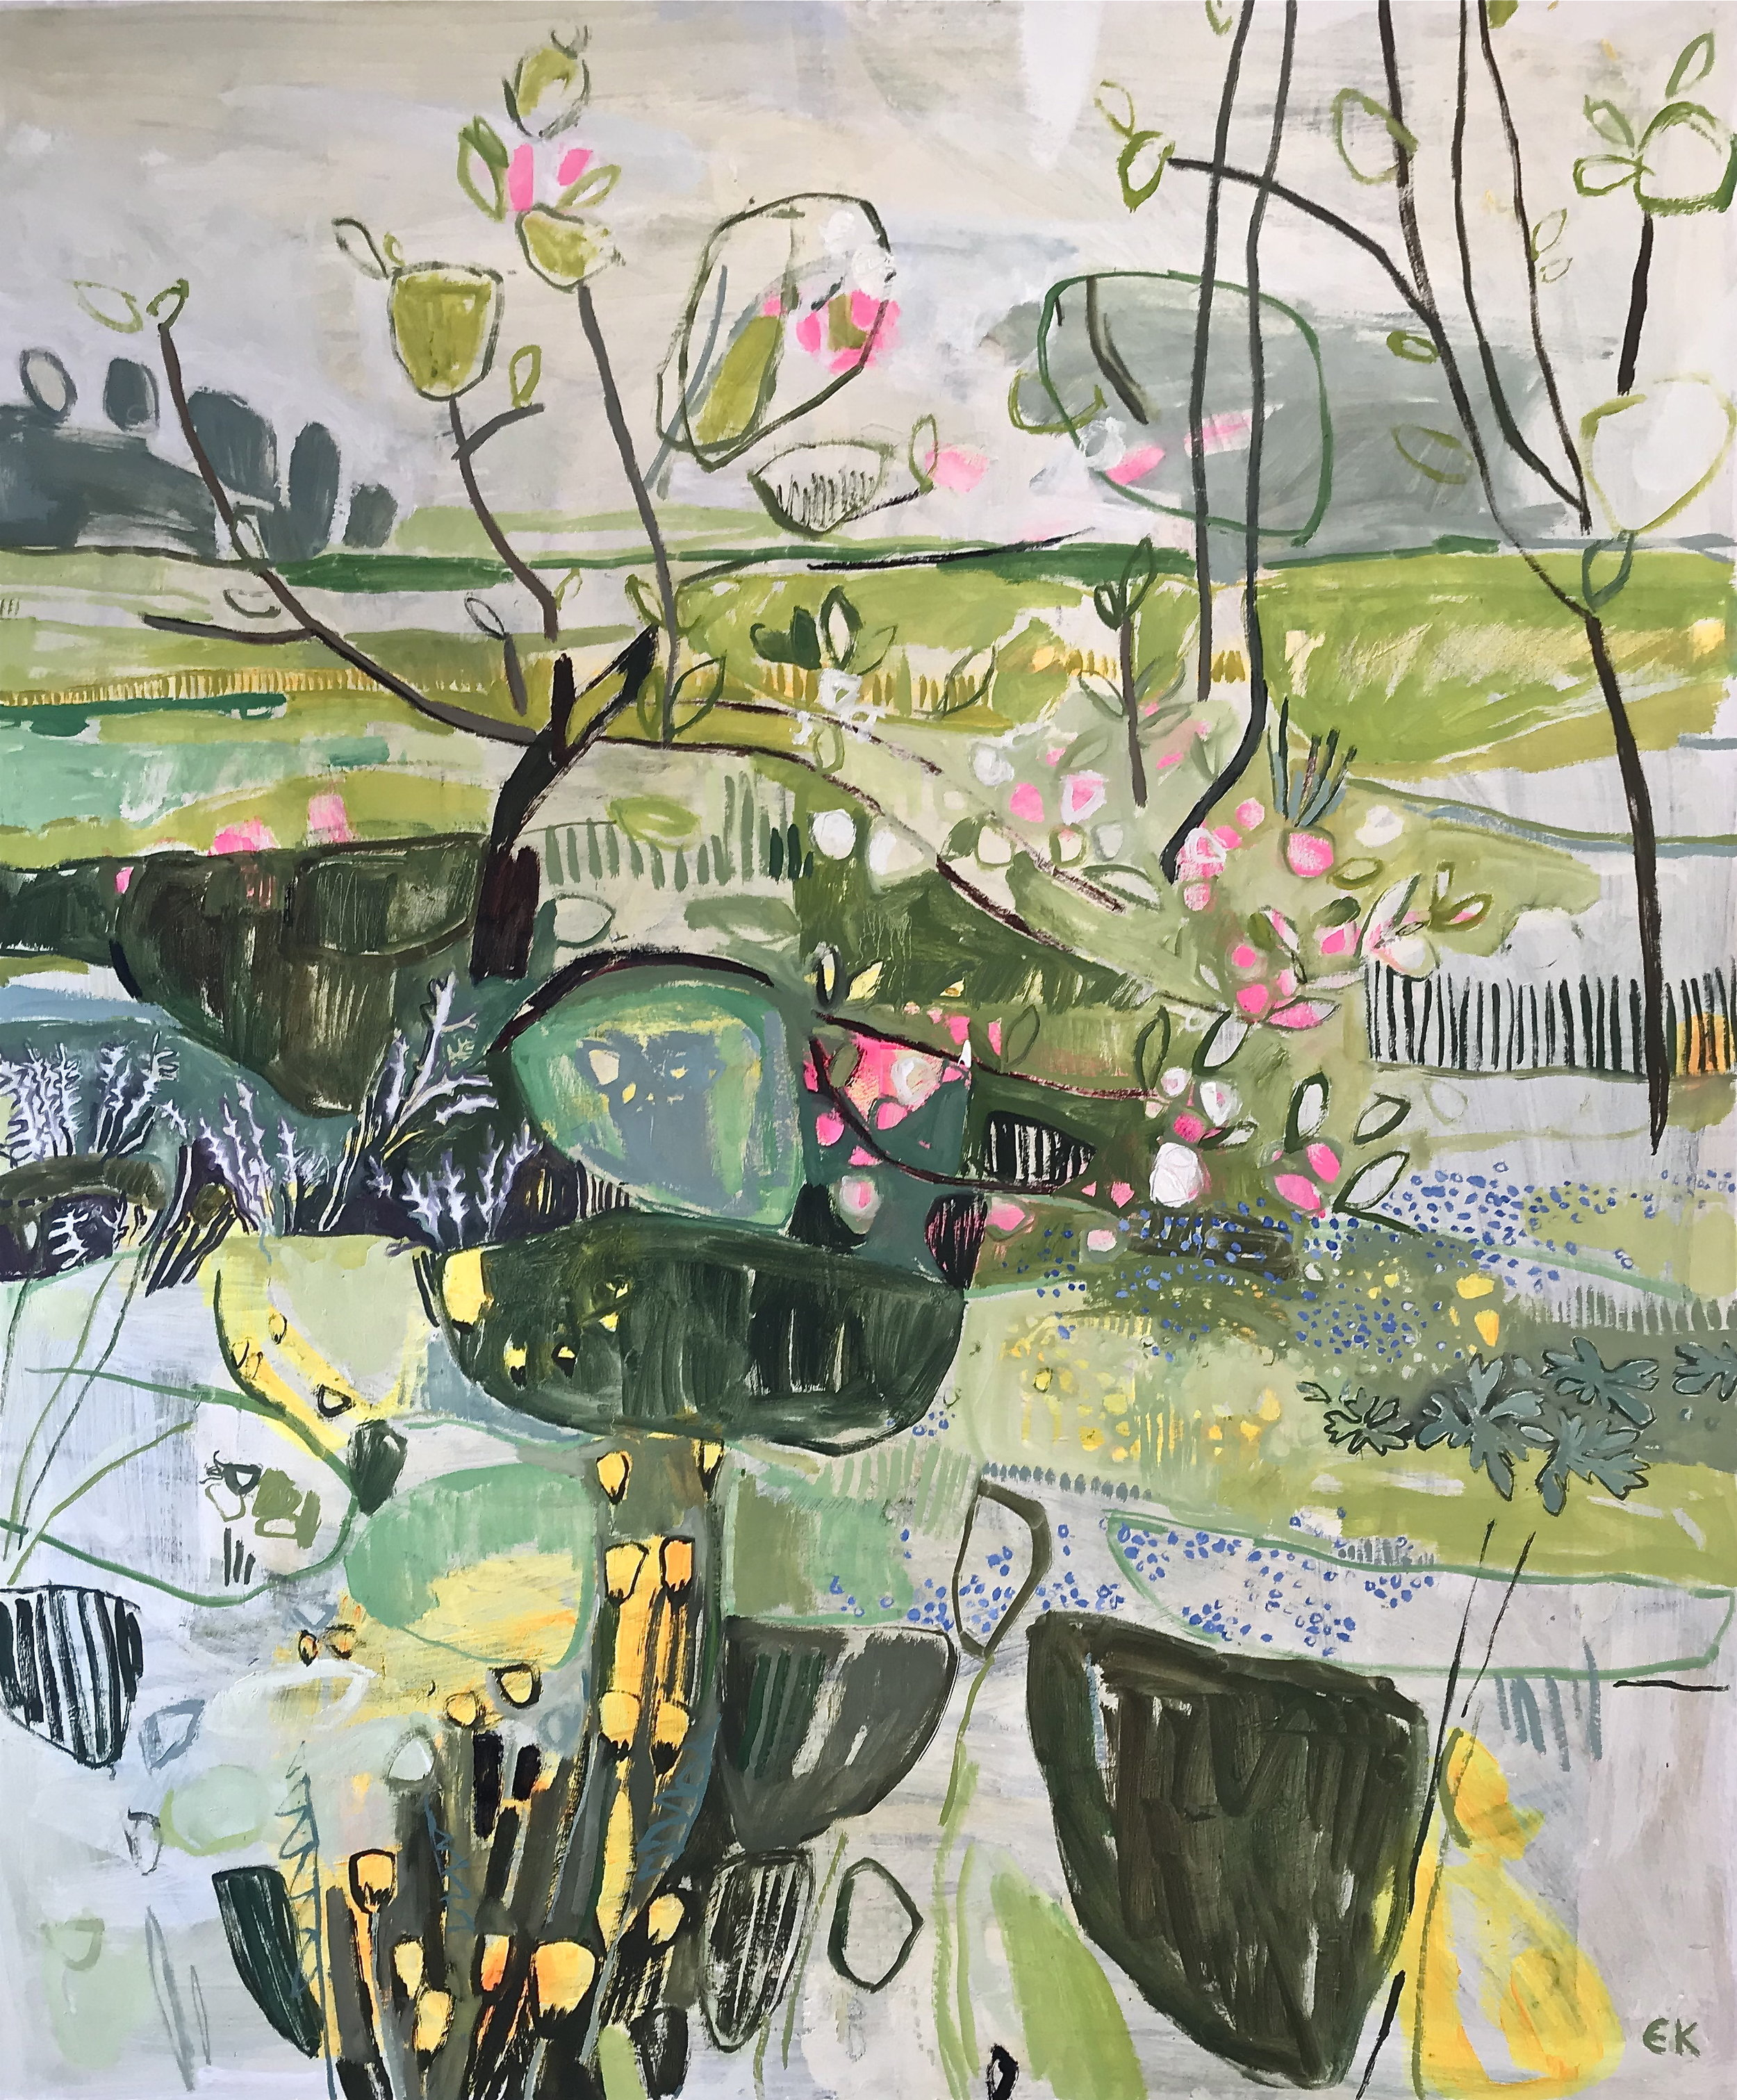 Apple Blossom at Botley Lane Allotments (Twenty Pound Meadow), Oxford I